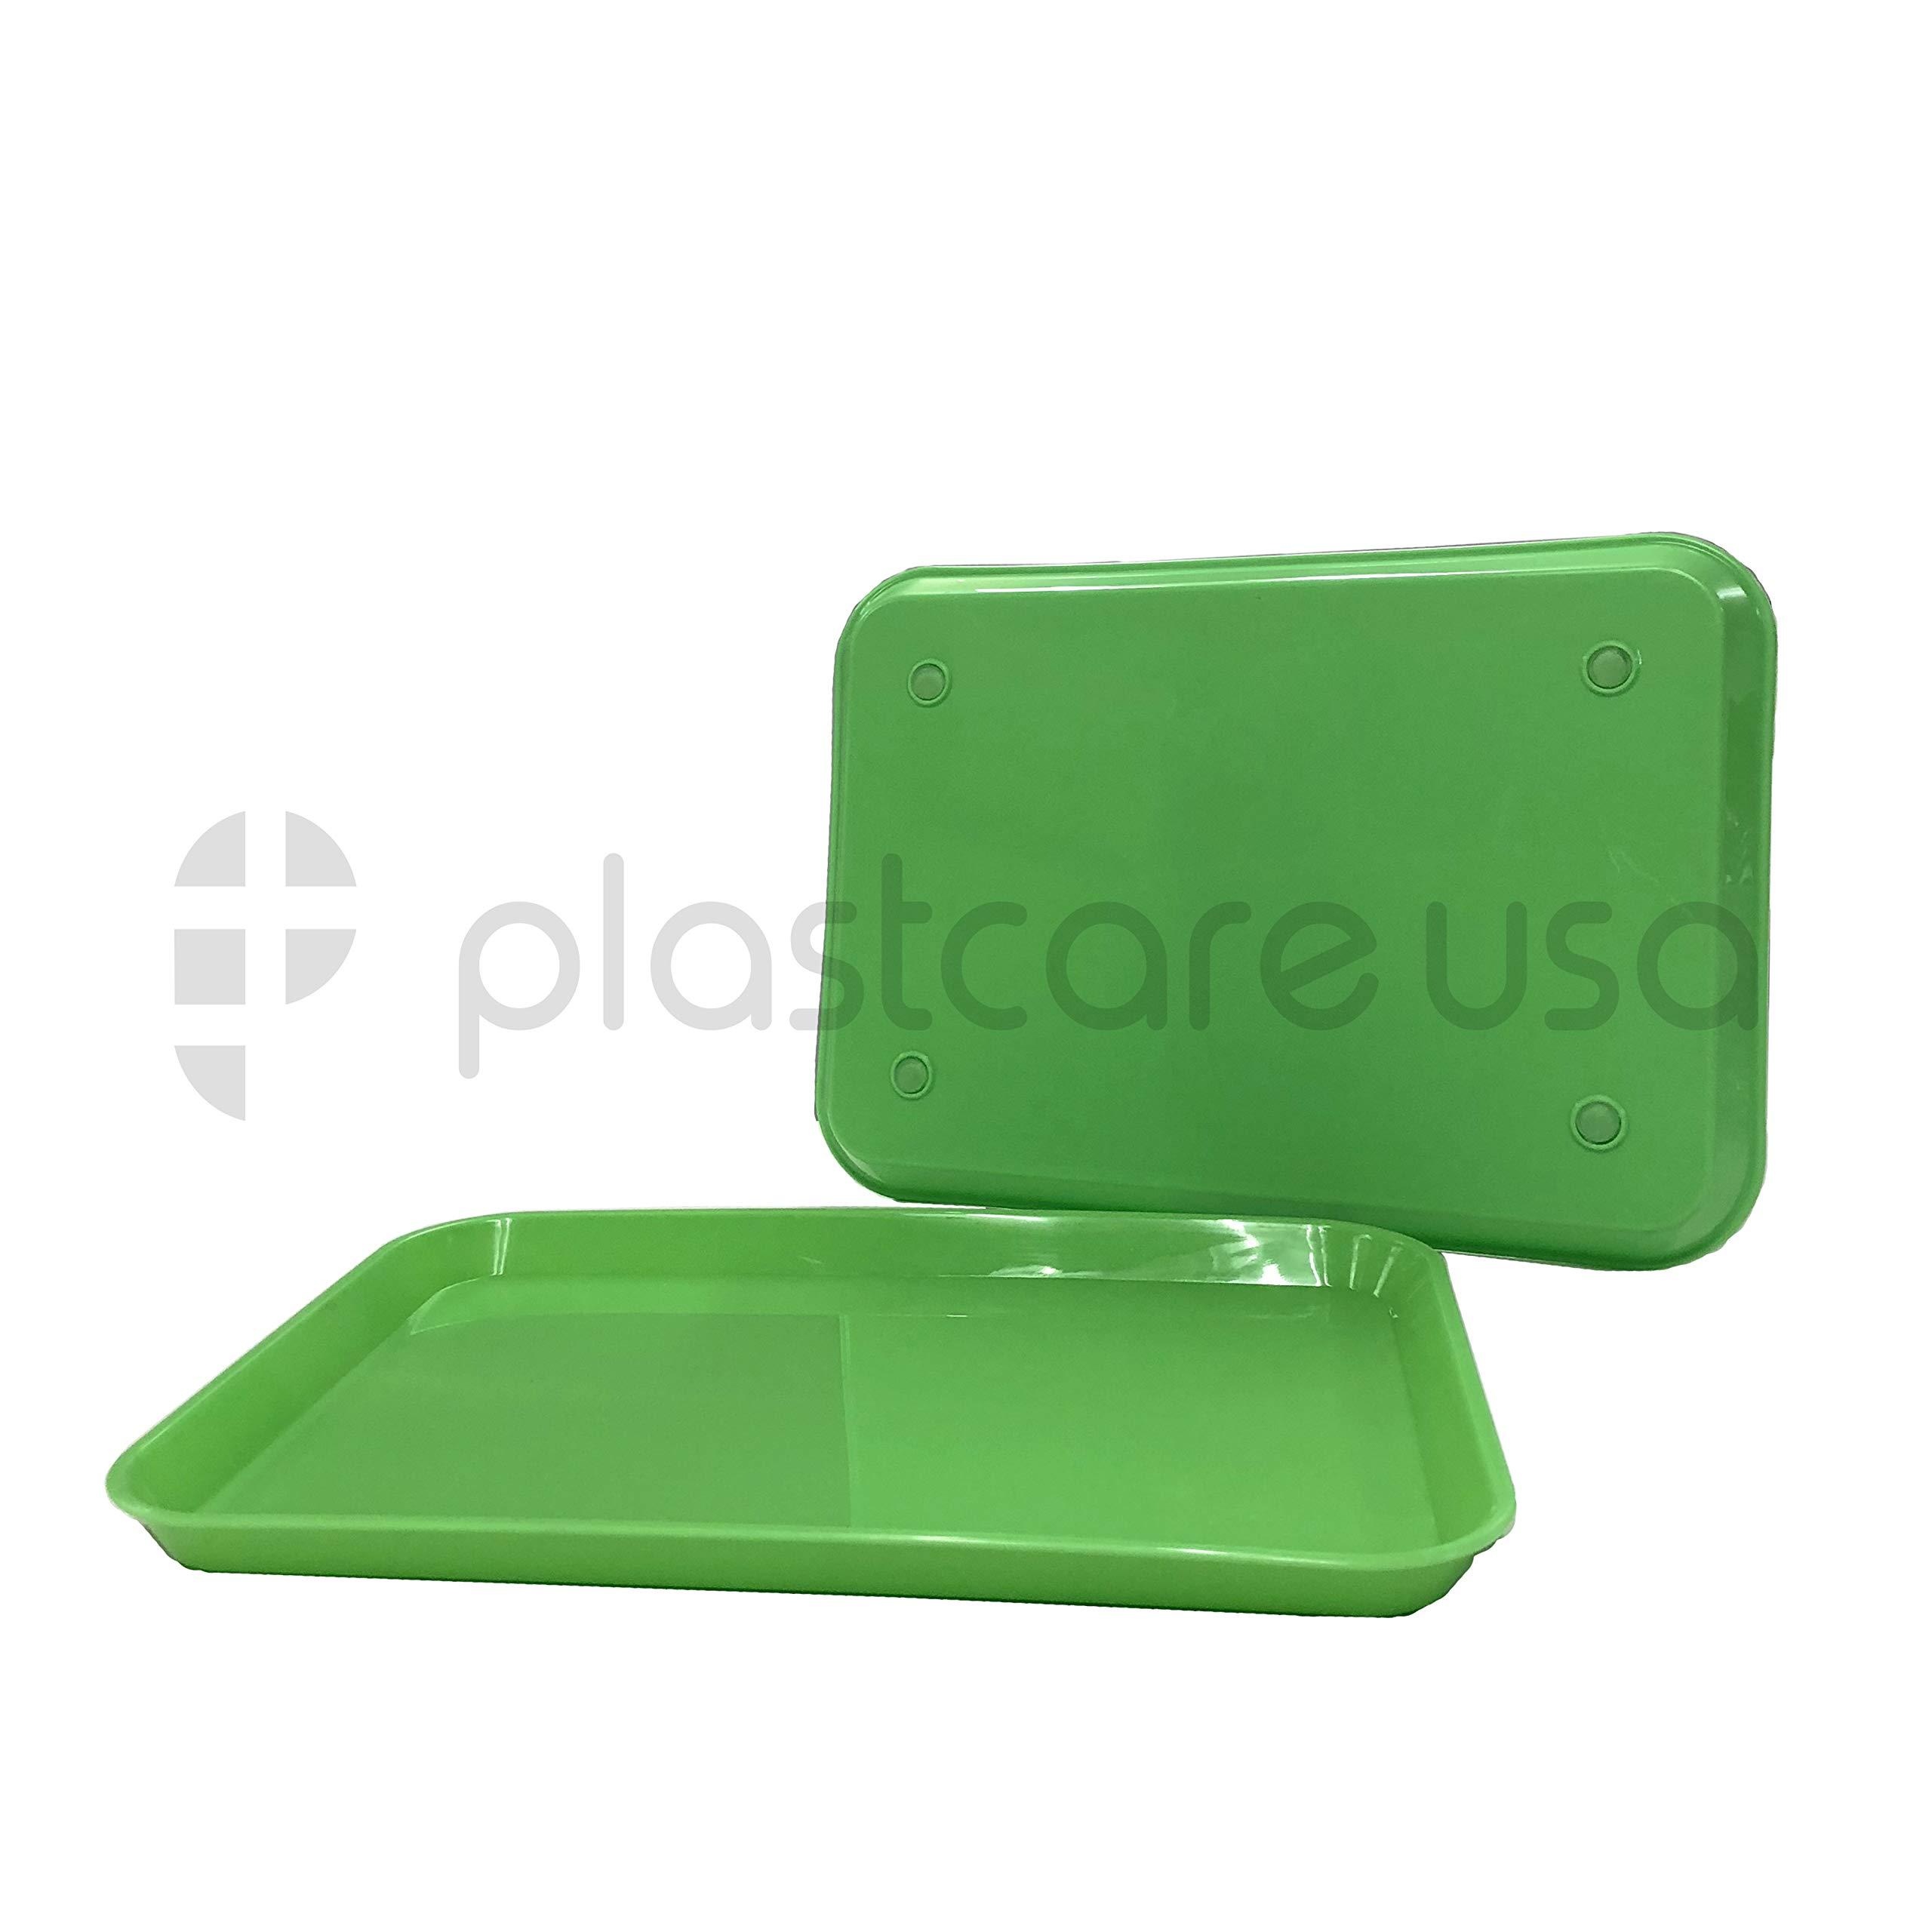 Green Autoclavable Autoclave Plastic Instrument Set Up Procedure Flat Trays, Size B (Pack of 12)